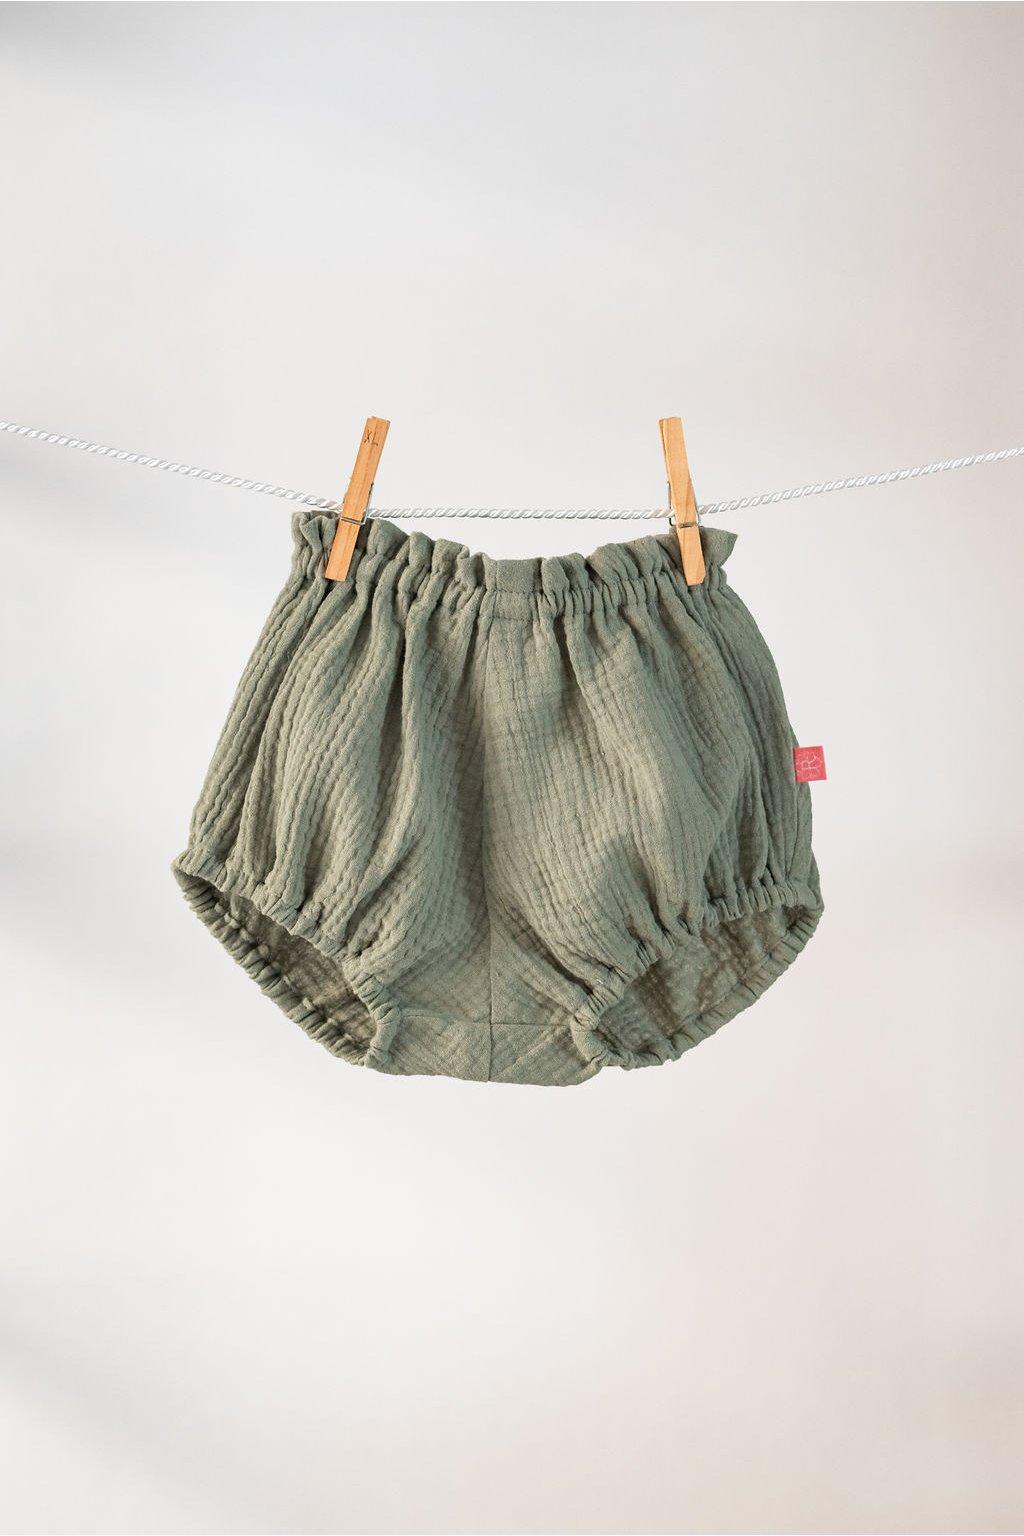 reparada muselinove kratasky detske khaki zelene